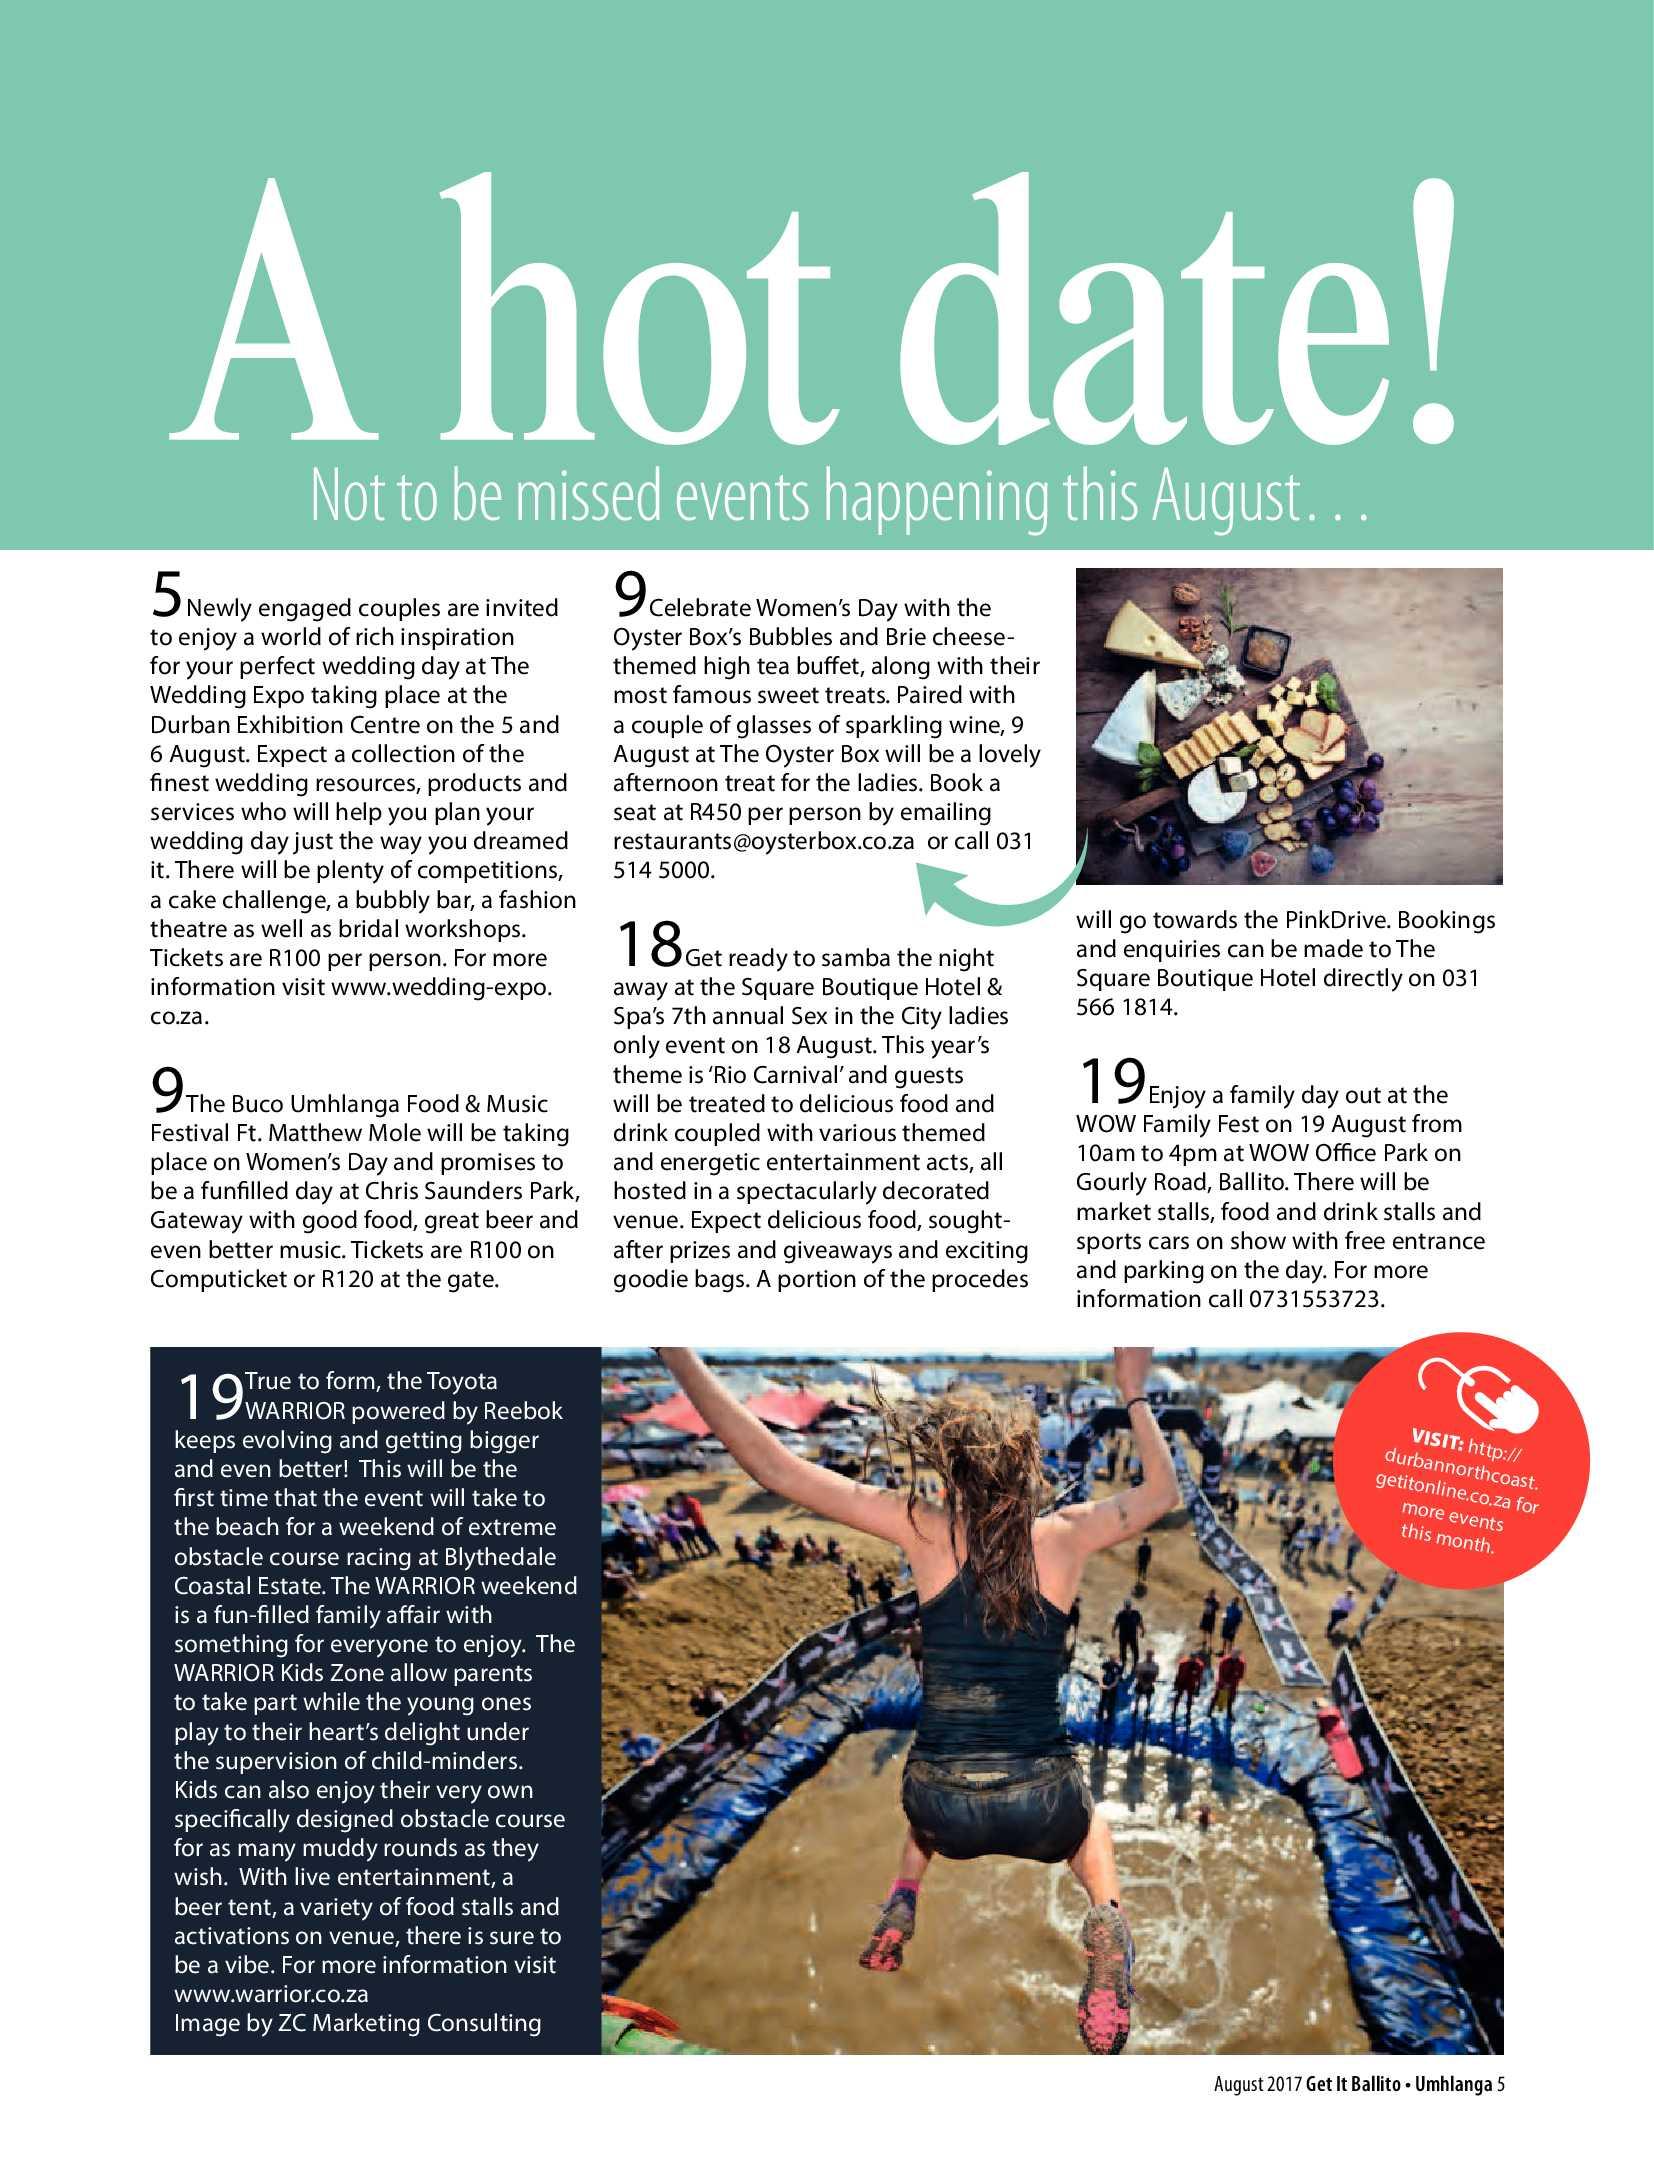 get-magazine-ballitoumhlanga-august-2017-epapers-page-7